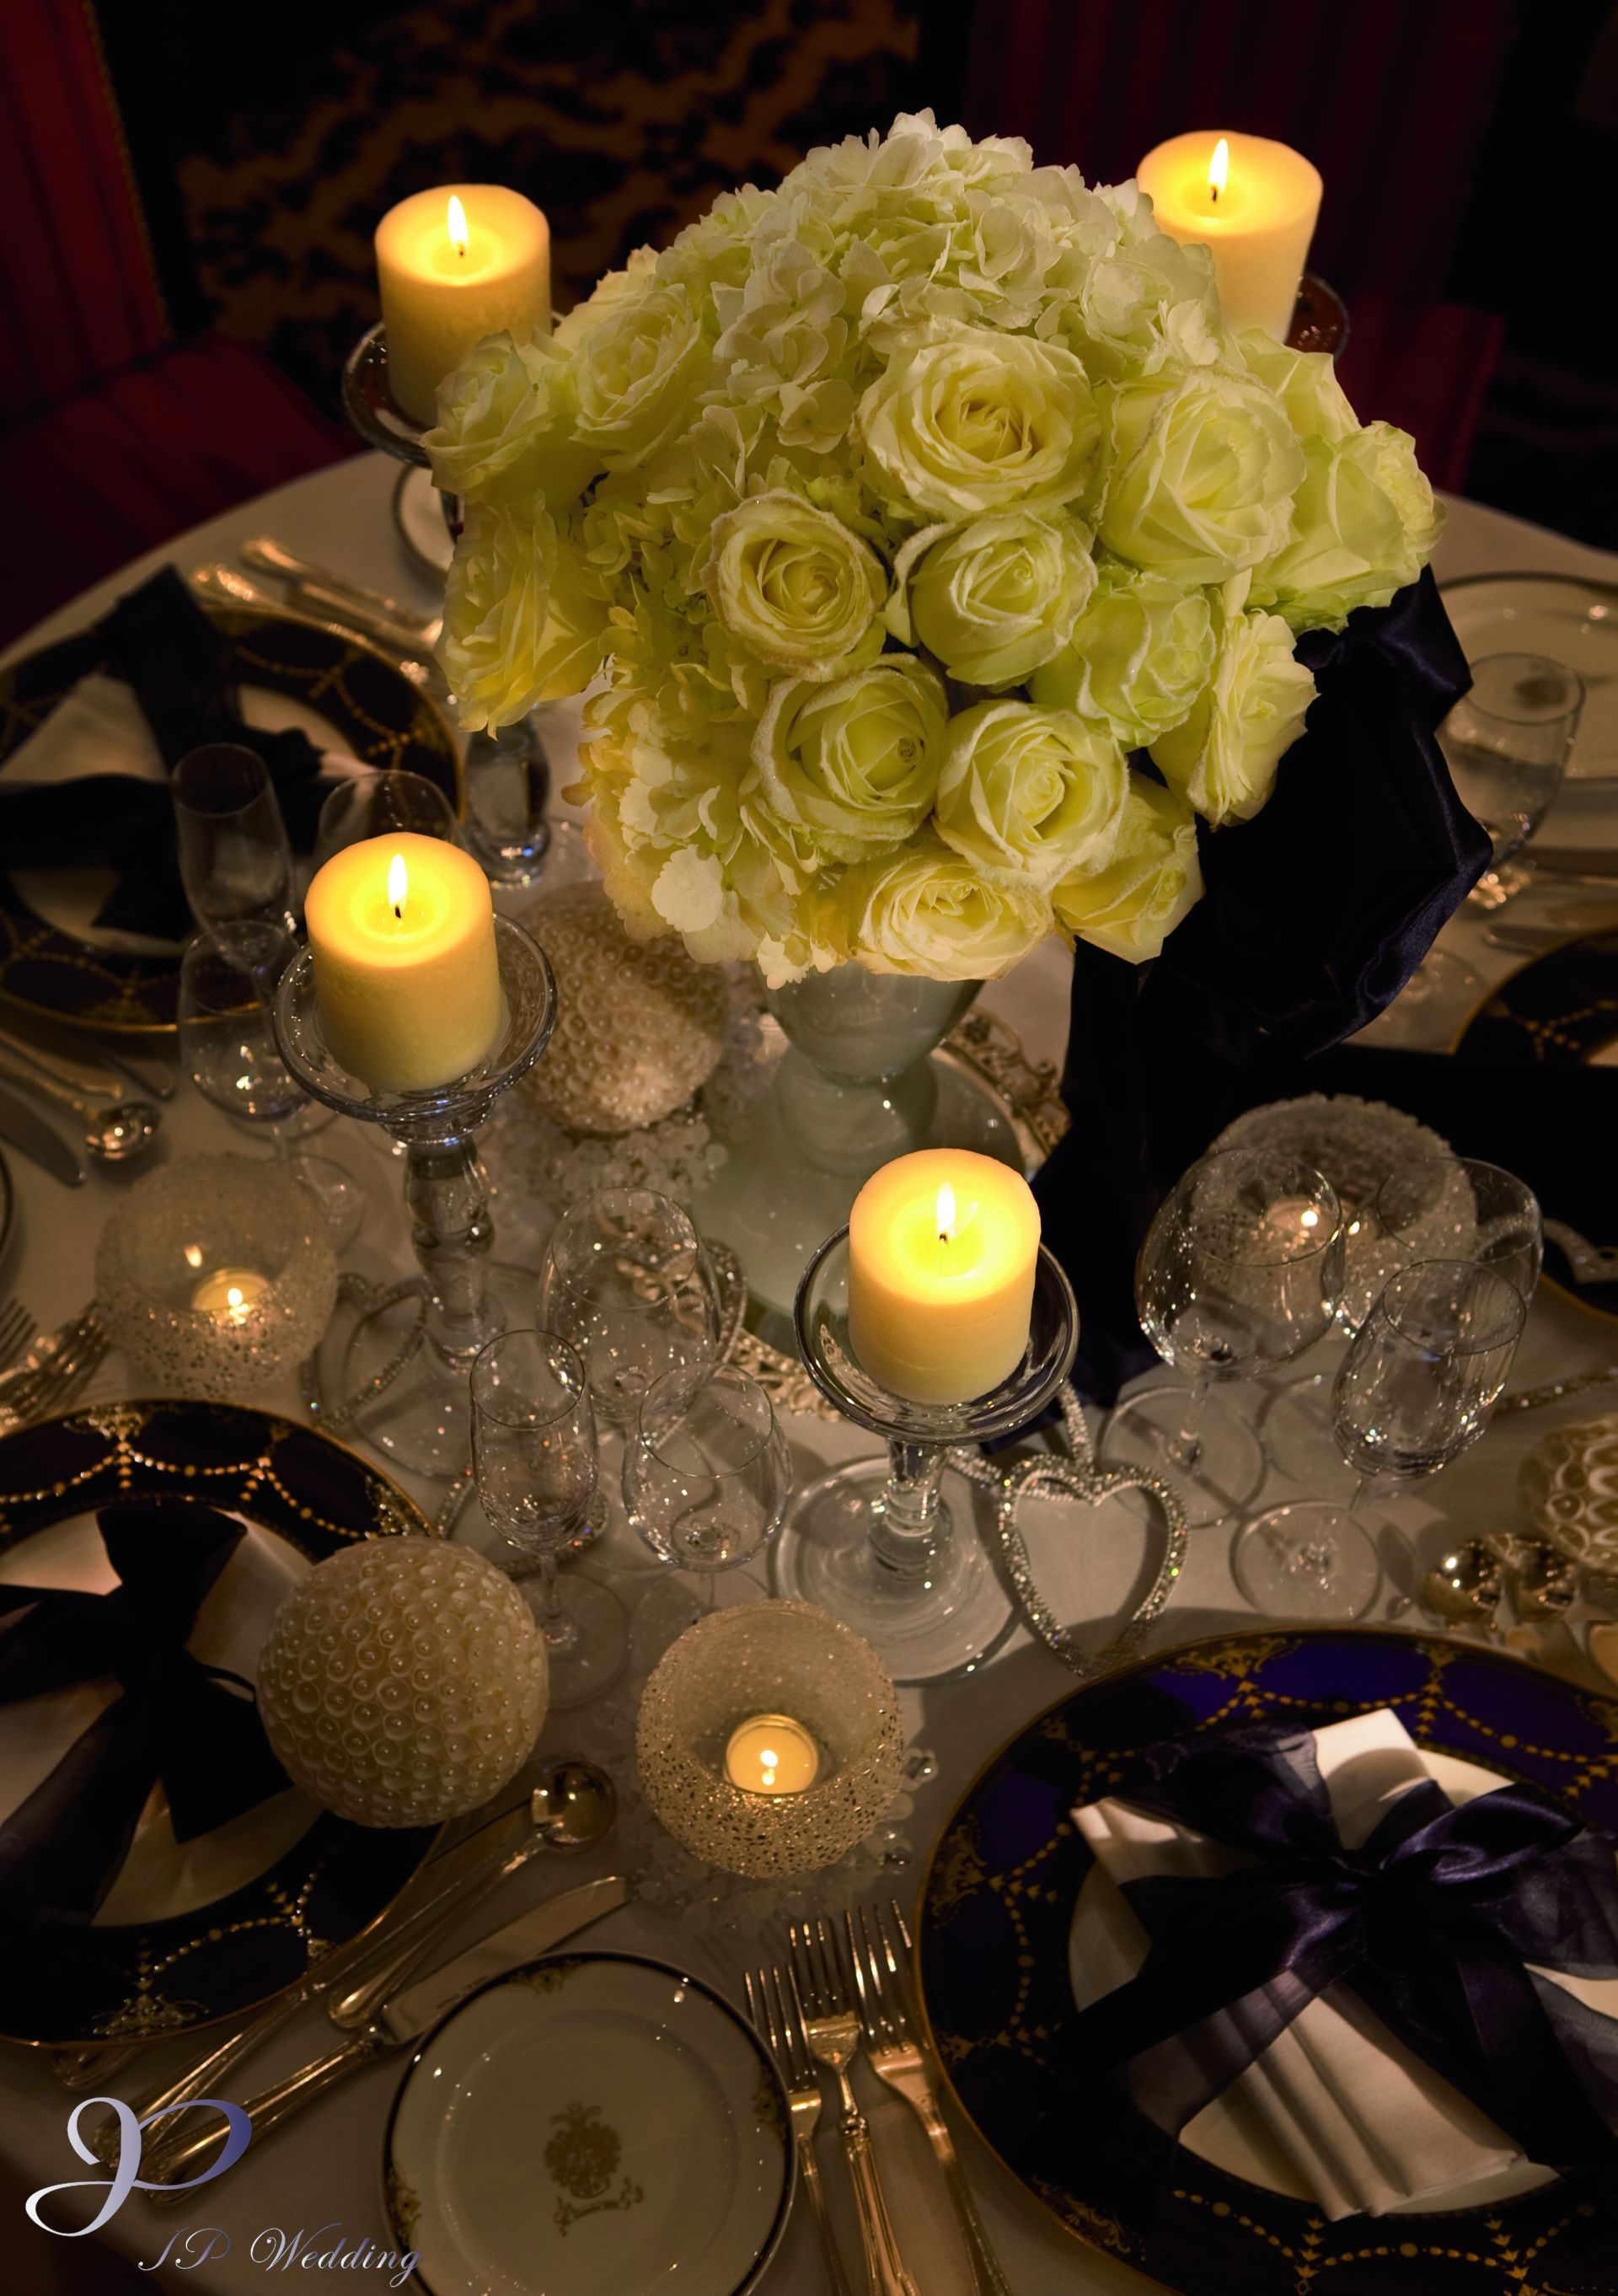 jp wedding, wedding banquet room